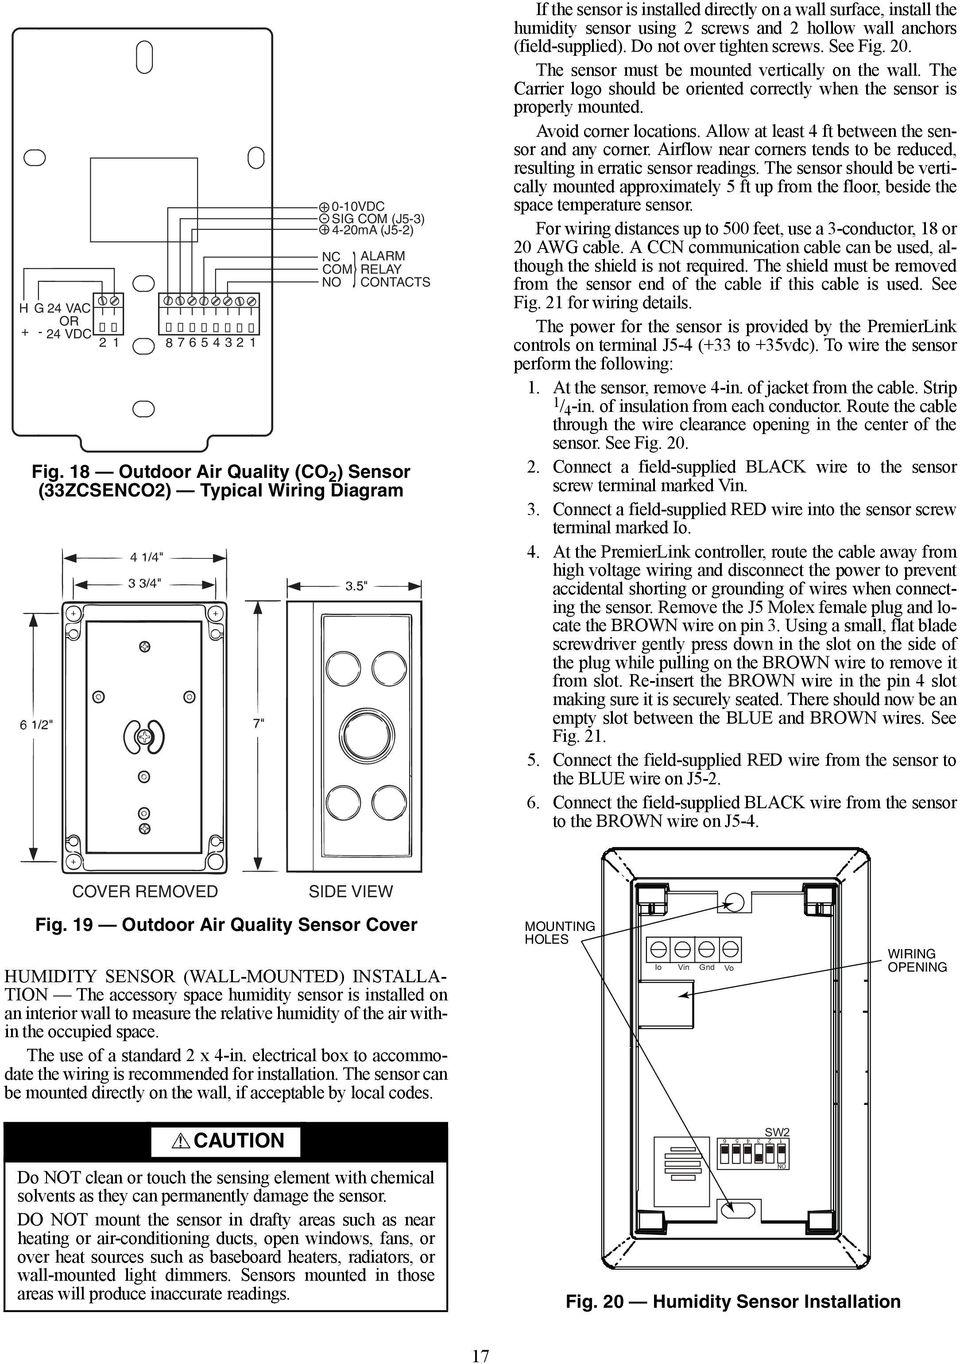 medium resolution of  field supplied do not over tighten screws see fig 20